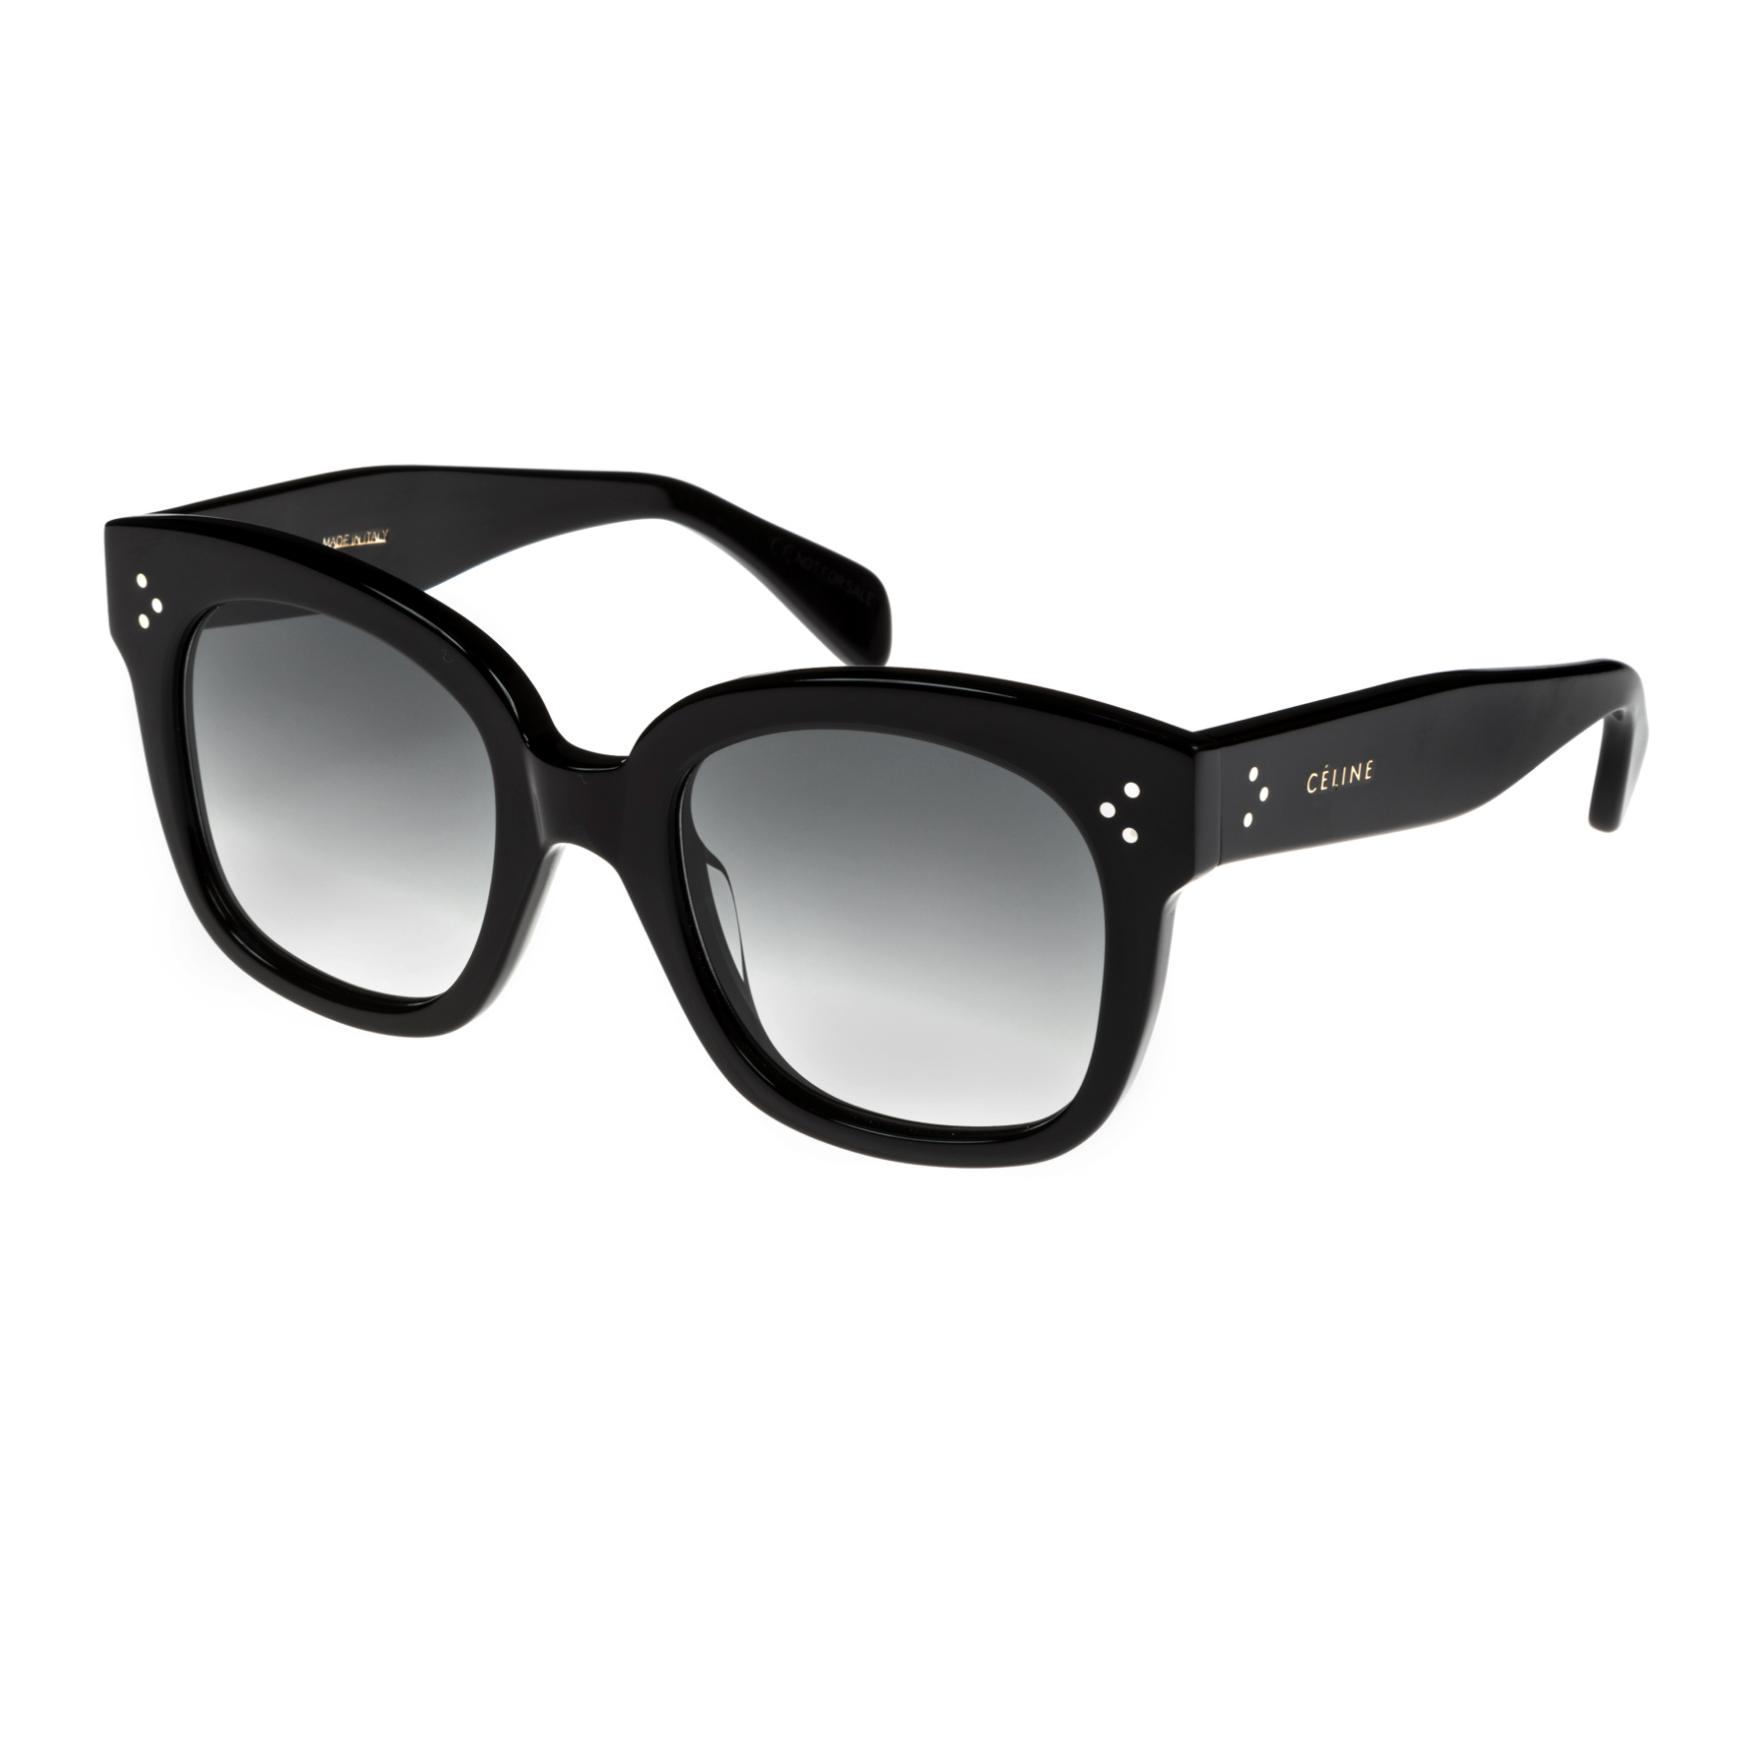 CELINE- CL40002U Sunglasses  £270 (Sold out)  COLOUR Black  CATEGORY SUN  MATERIAL Acetate  SHAPE Square